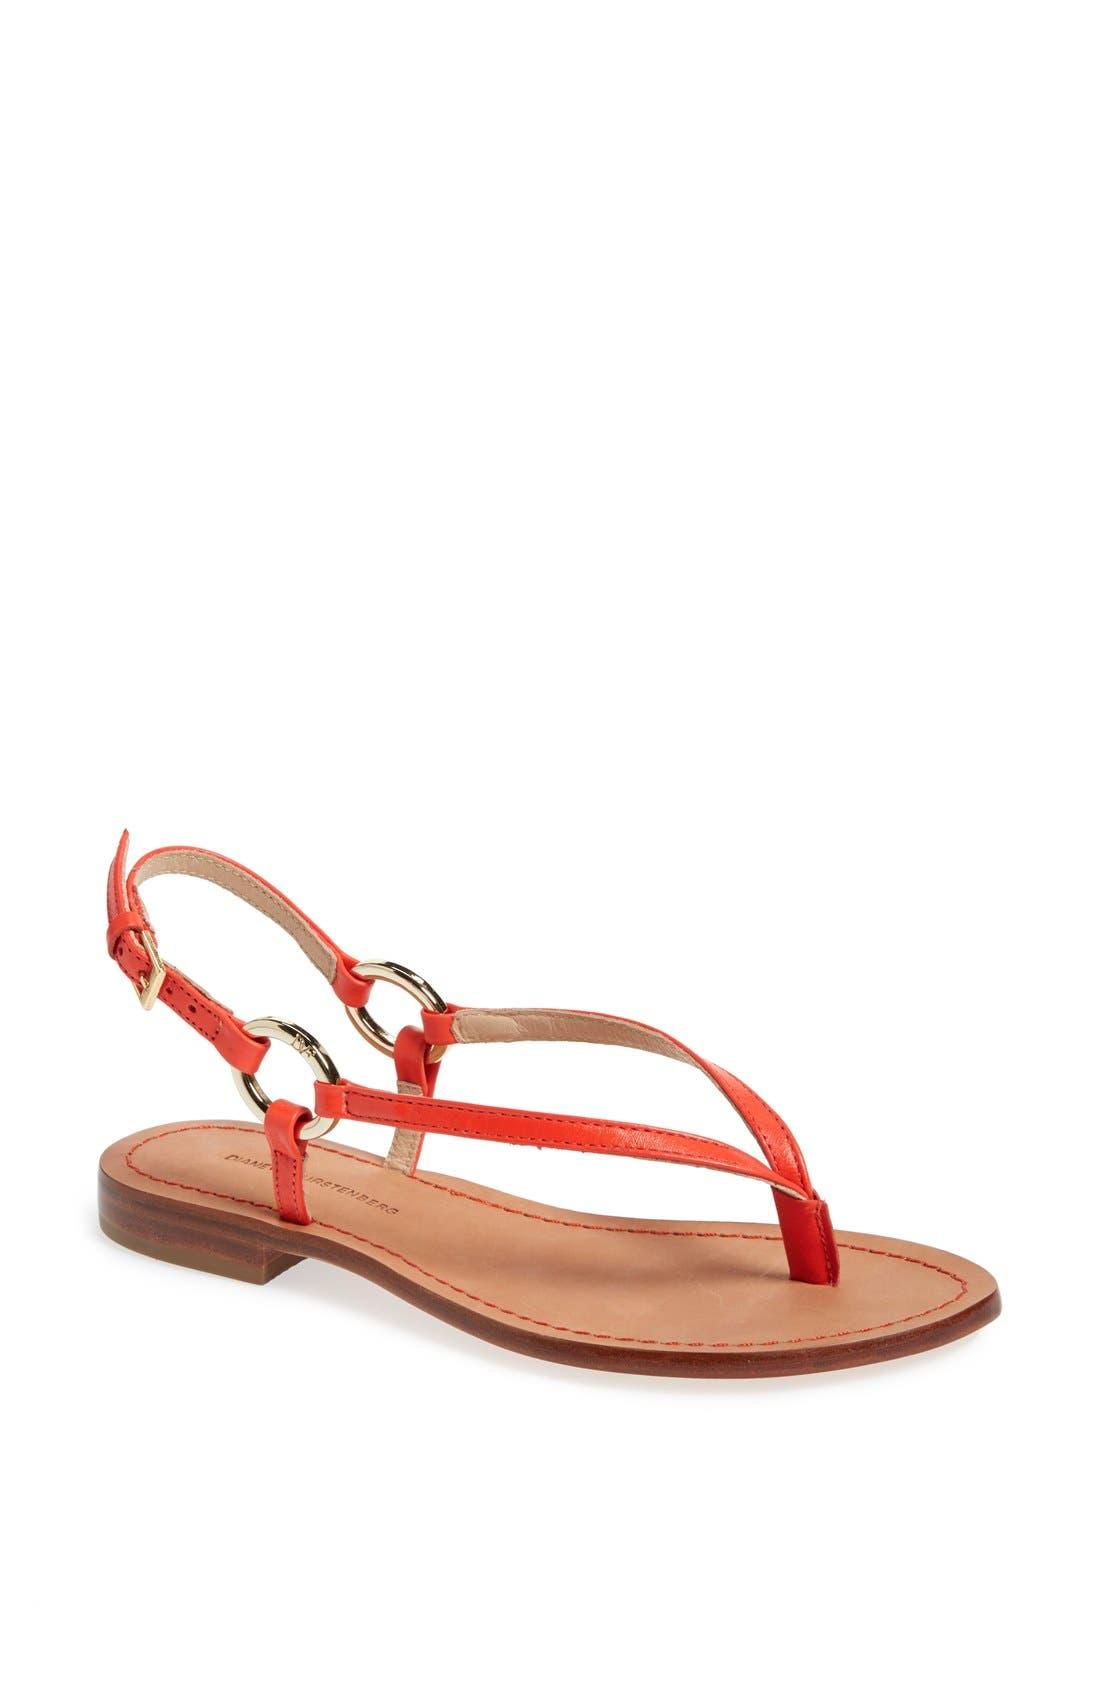 Main Image - Diane von Furstenberg 'Cailin' Thong Sandal